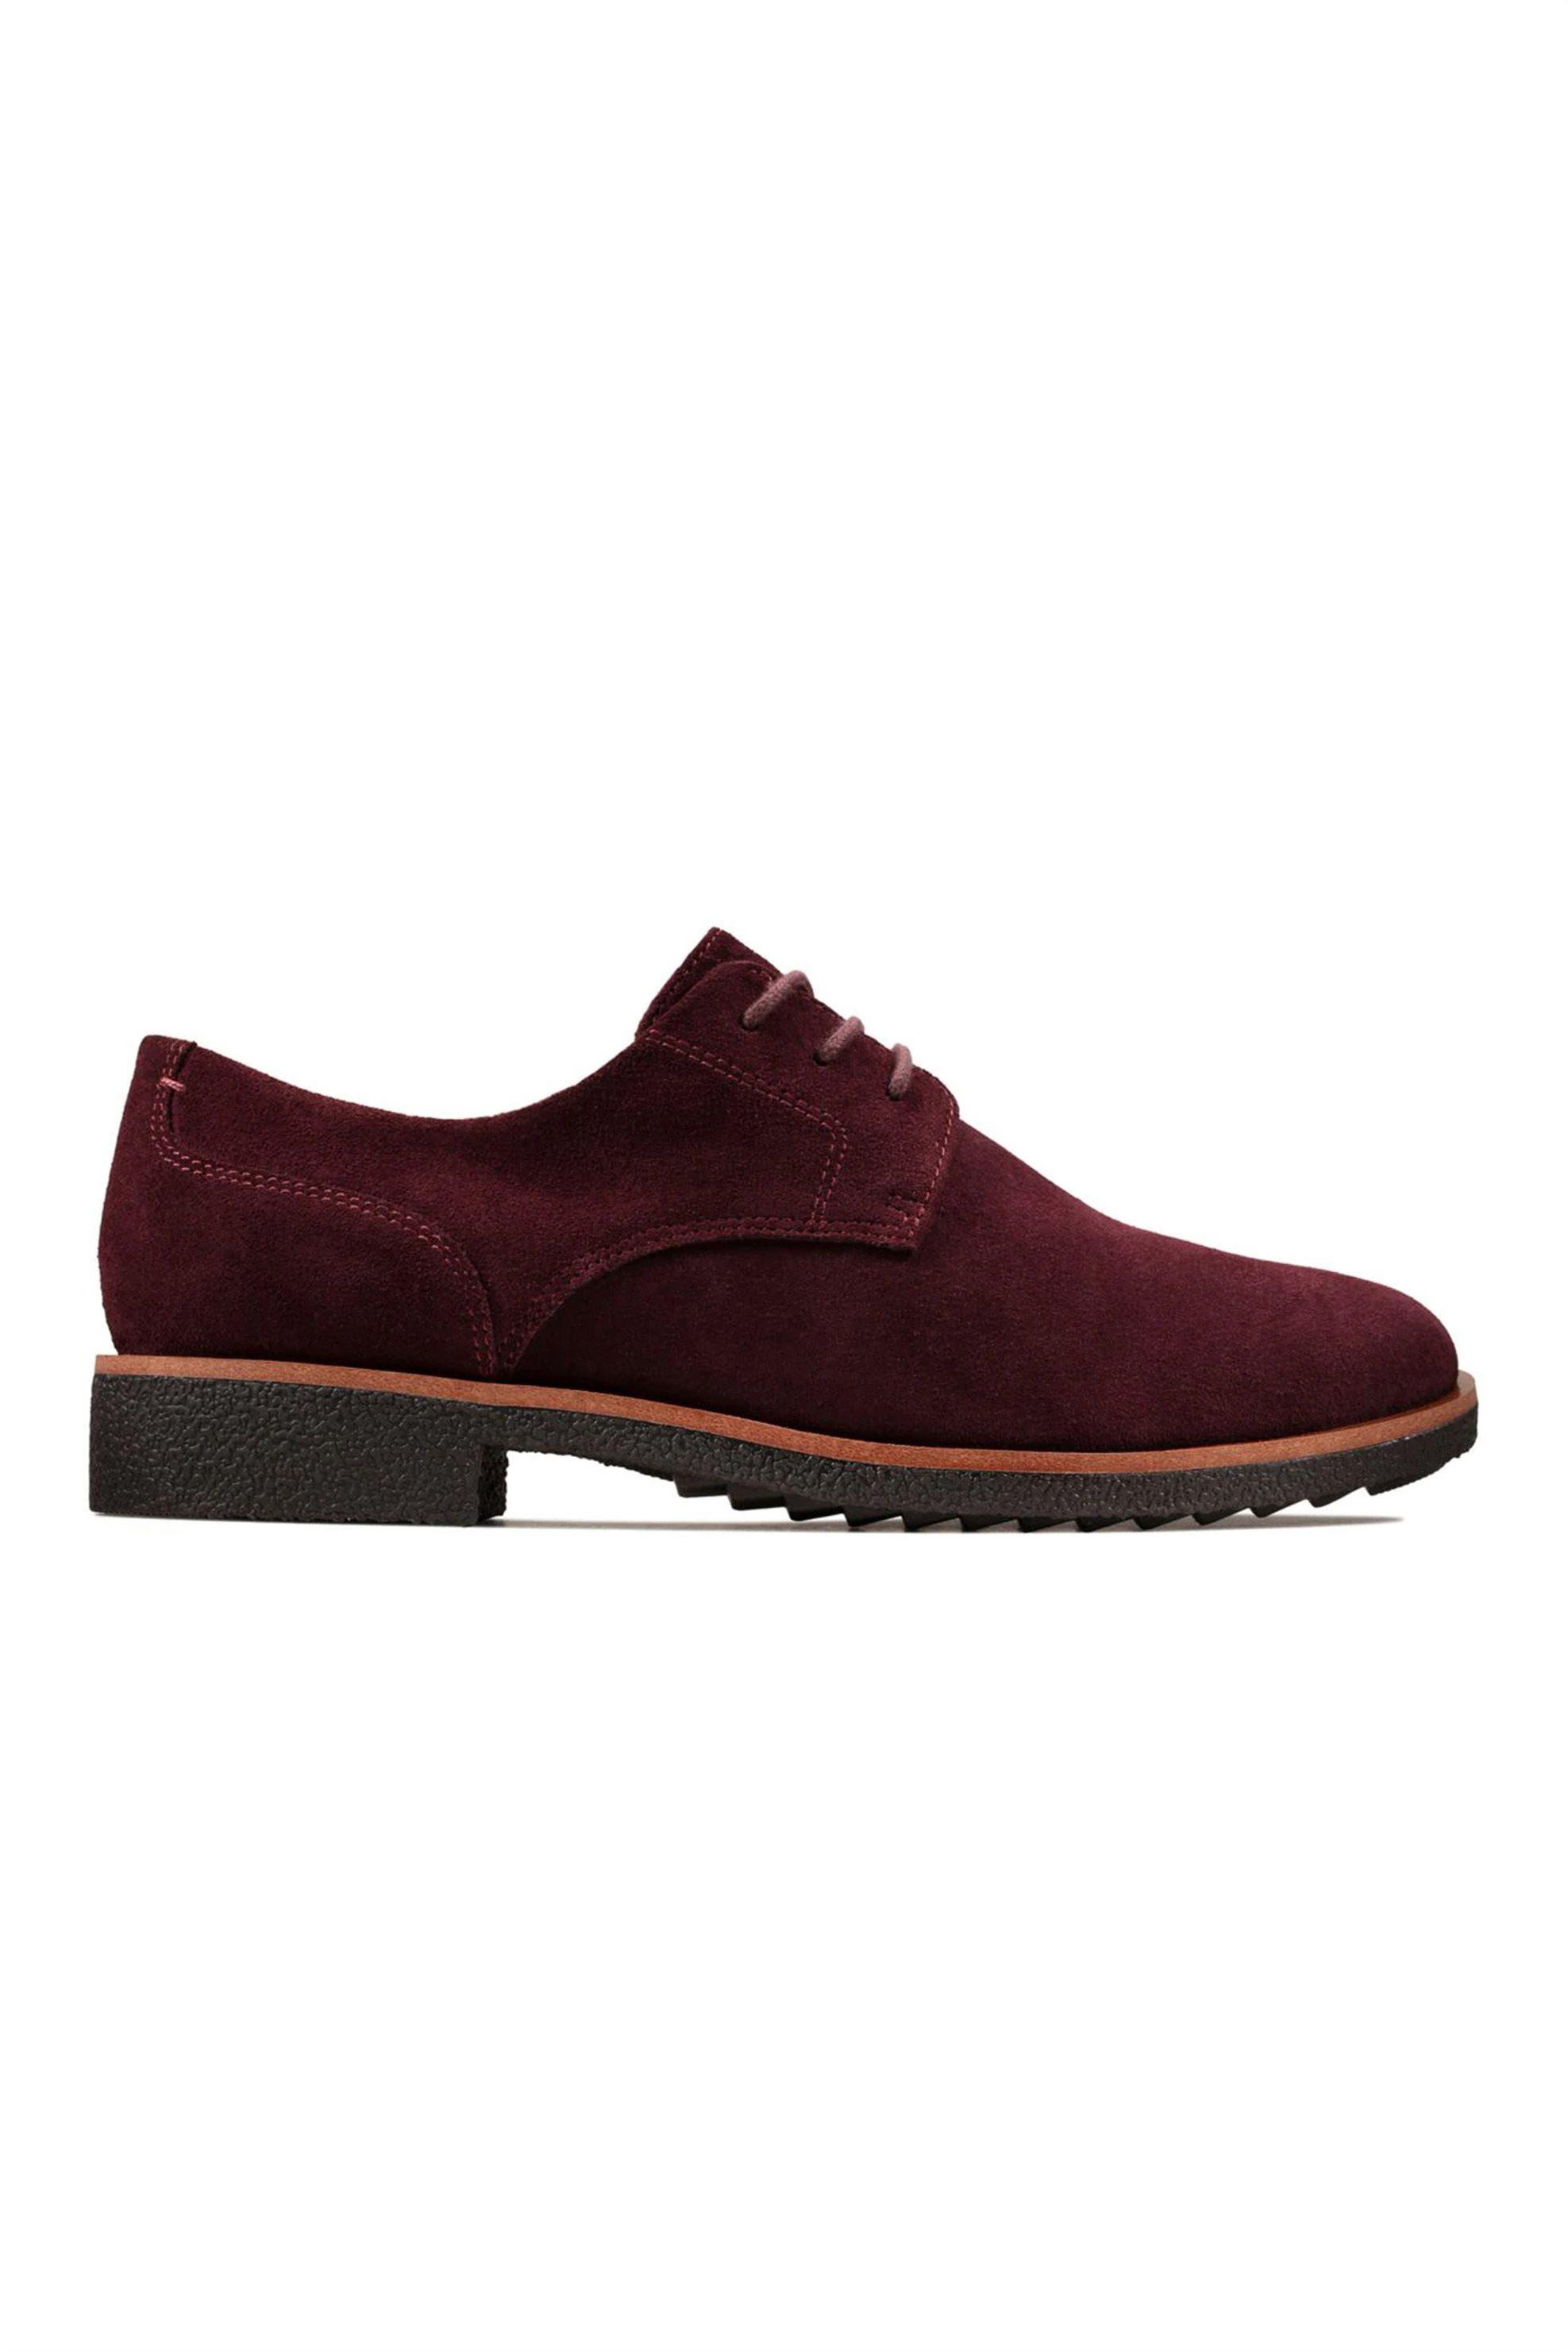 Clarks γυναικεία παπούτσια suede Oxford «Griffin Lane» – 26143112 – Μπορντό